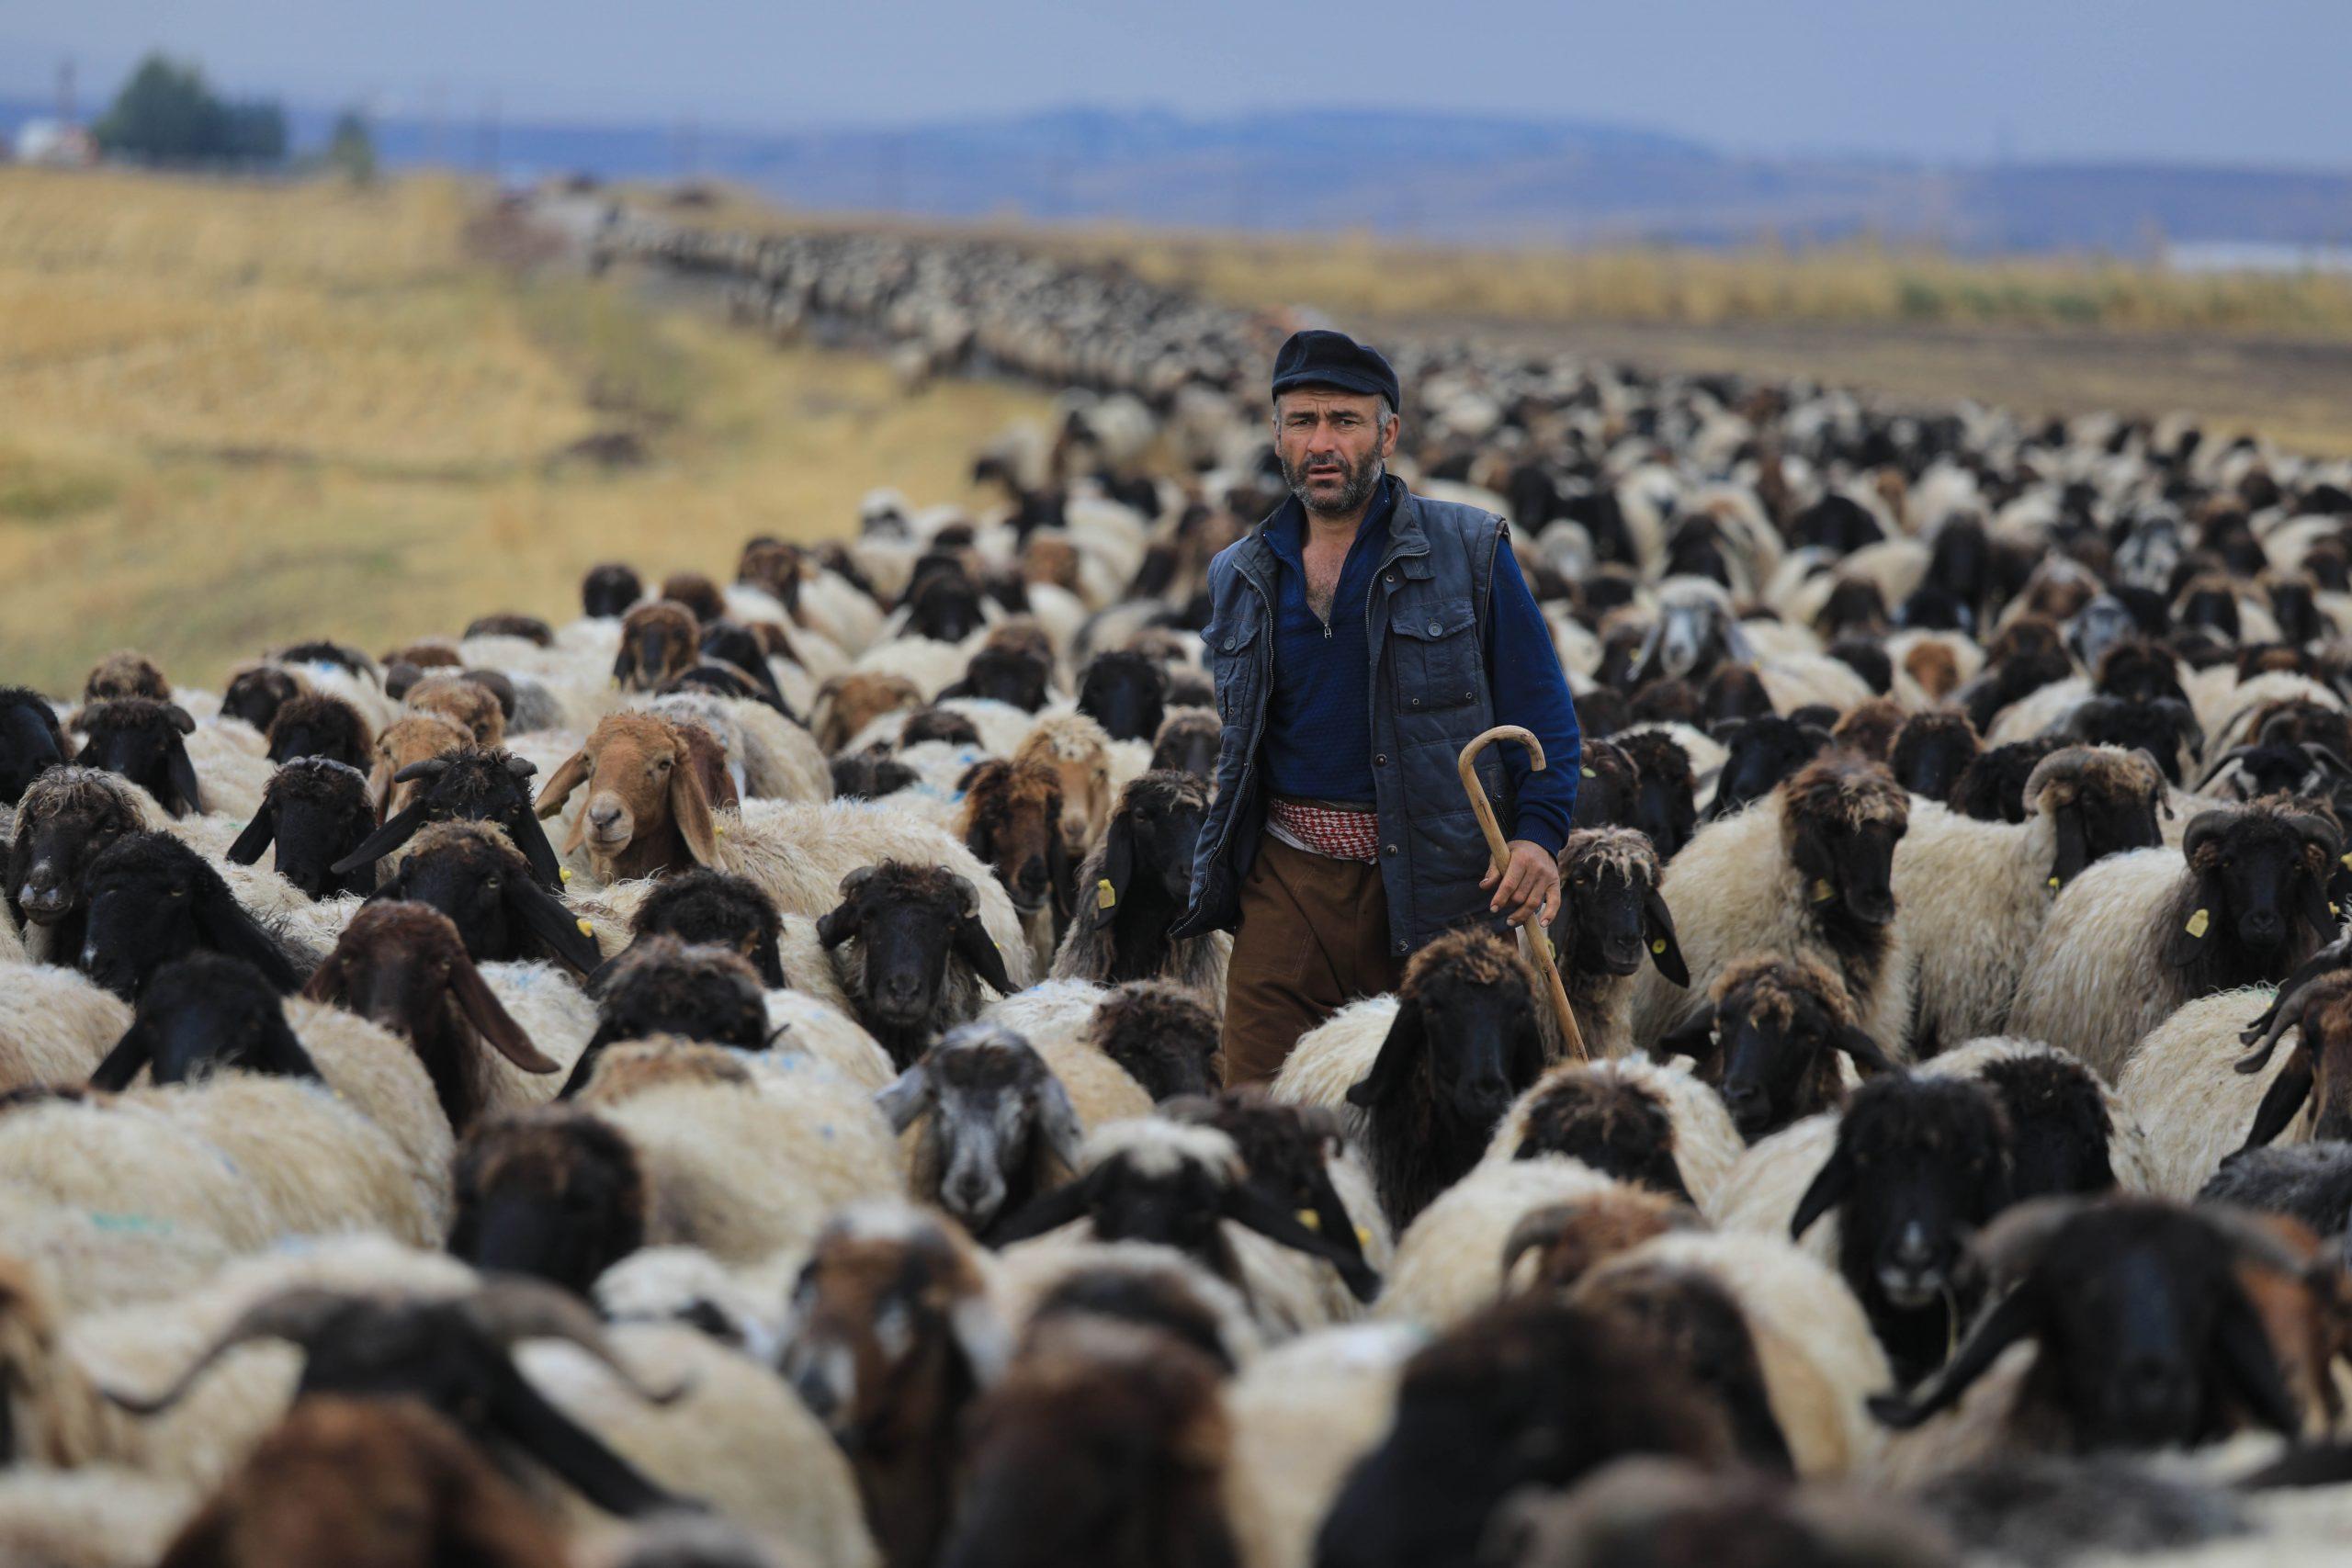 Sheep of Eastern Anatolia with long and glossy fibers, Tatvan, Bitlis